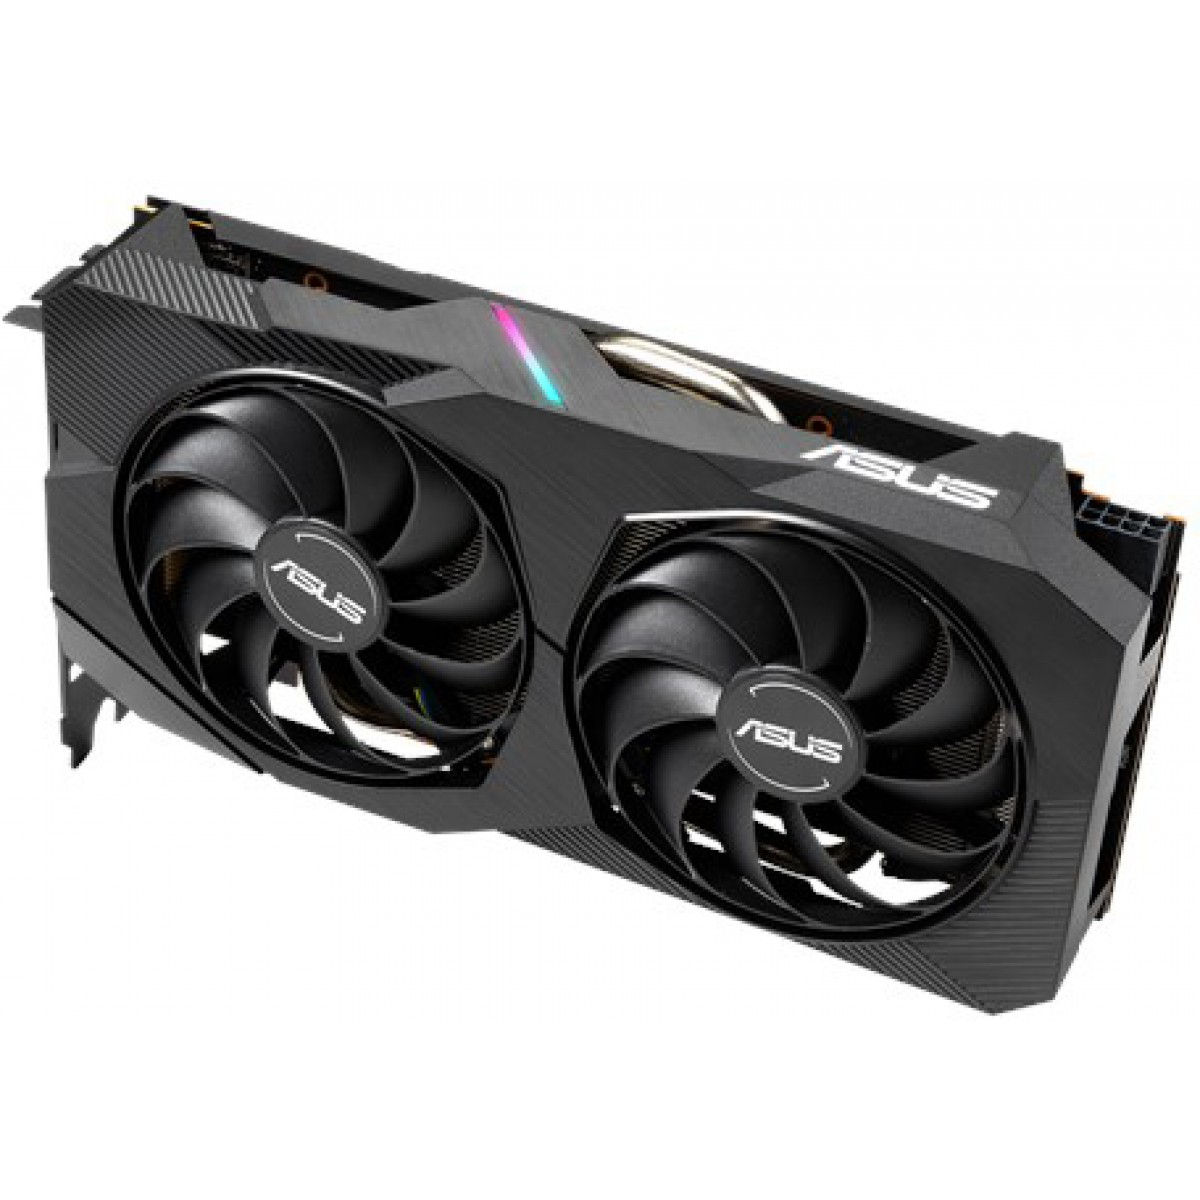 Placa de Vídeo Asus, Radeon, RX 5500 XT EVO, 8GB, GDDR6, 128Bit, DUAL-RX5500XT-O8G-EVO